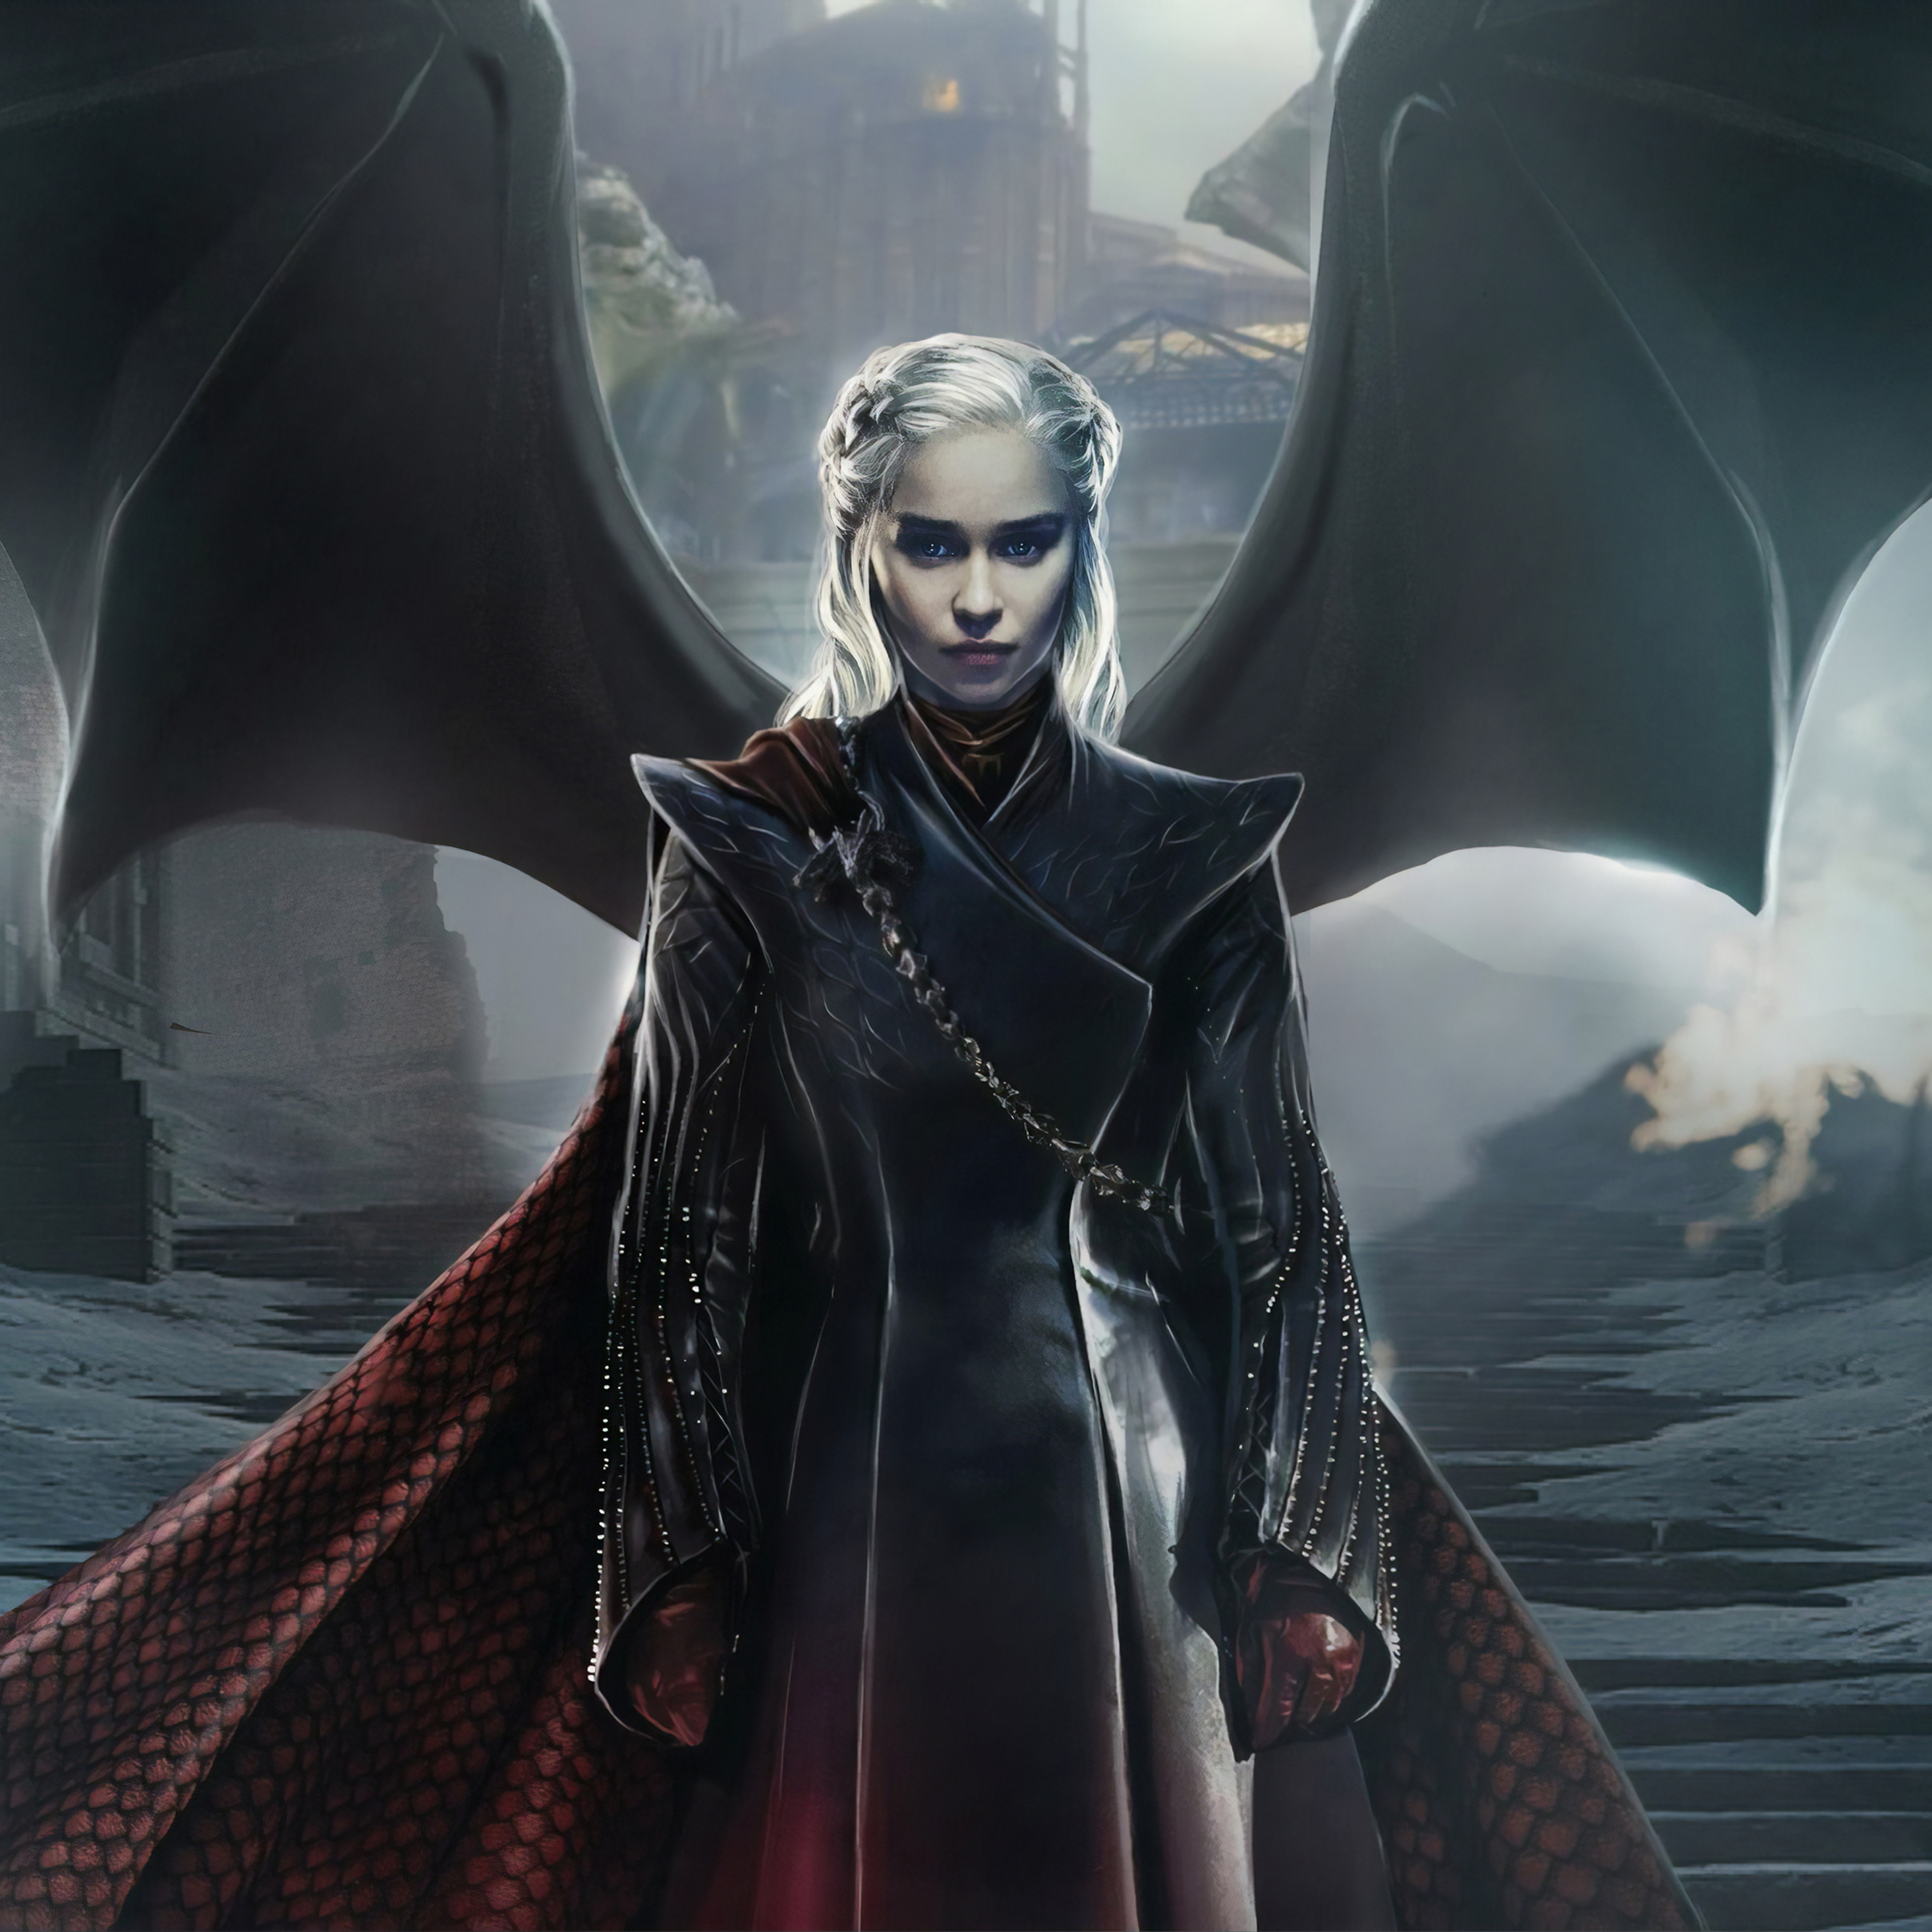 2932x2932 Daenerys Targaryen Game Of Thrones 4k Ipad Pro